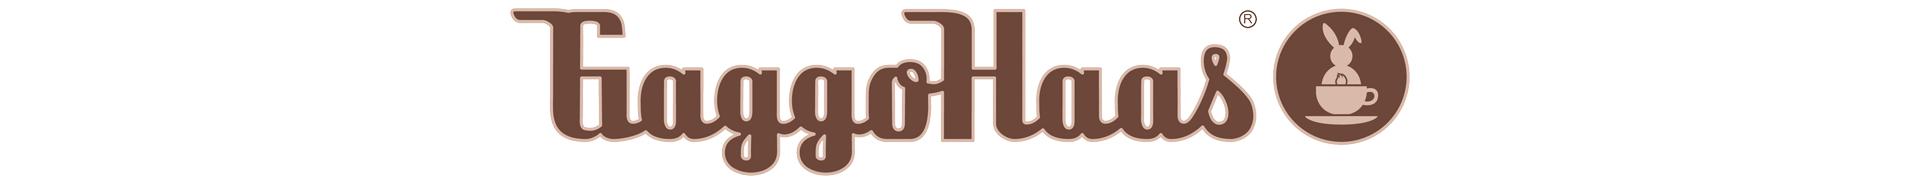 Gaggohaas_Logo2LUsPVXRCGCmj9